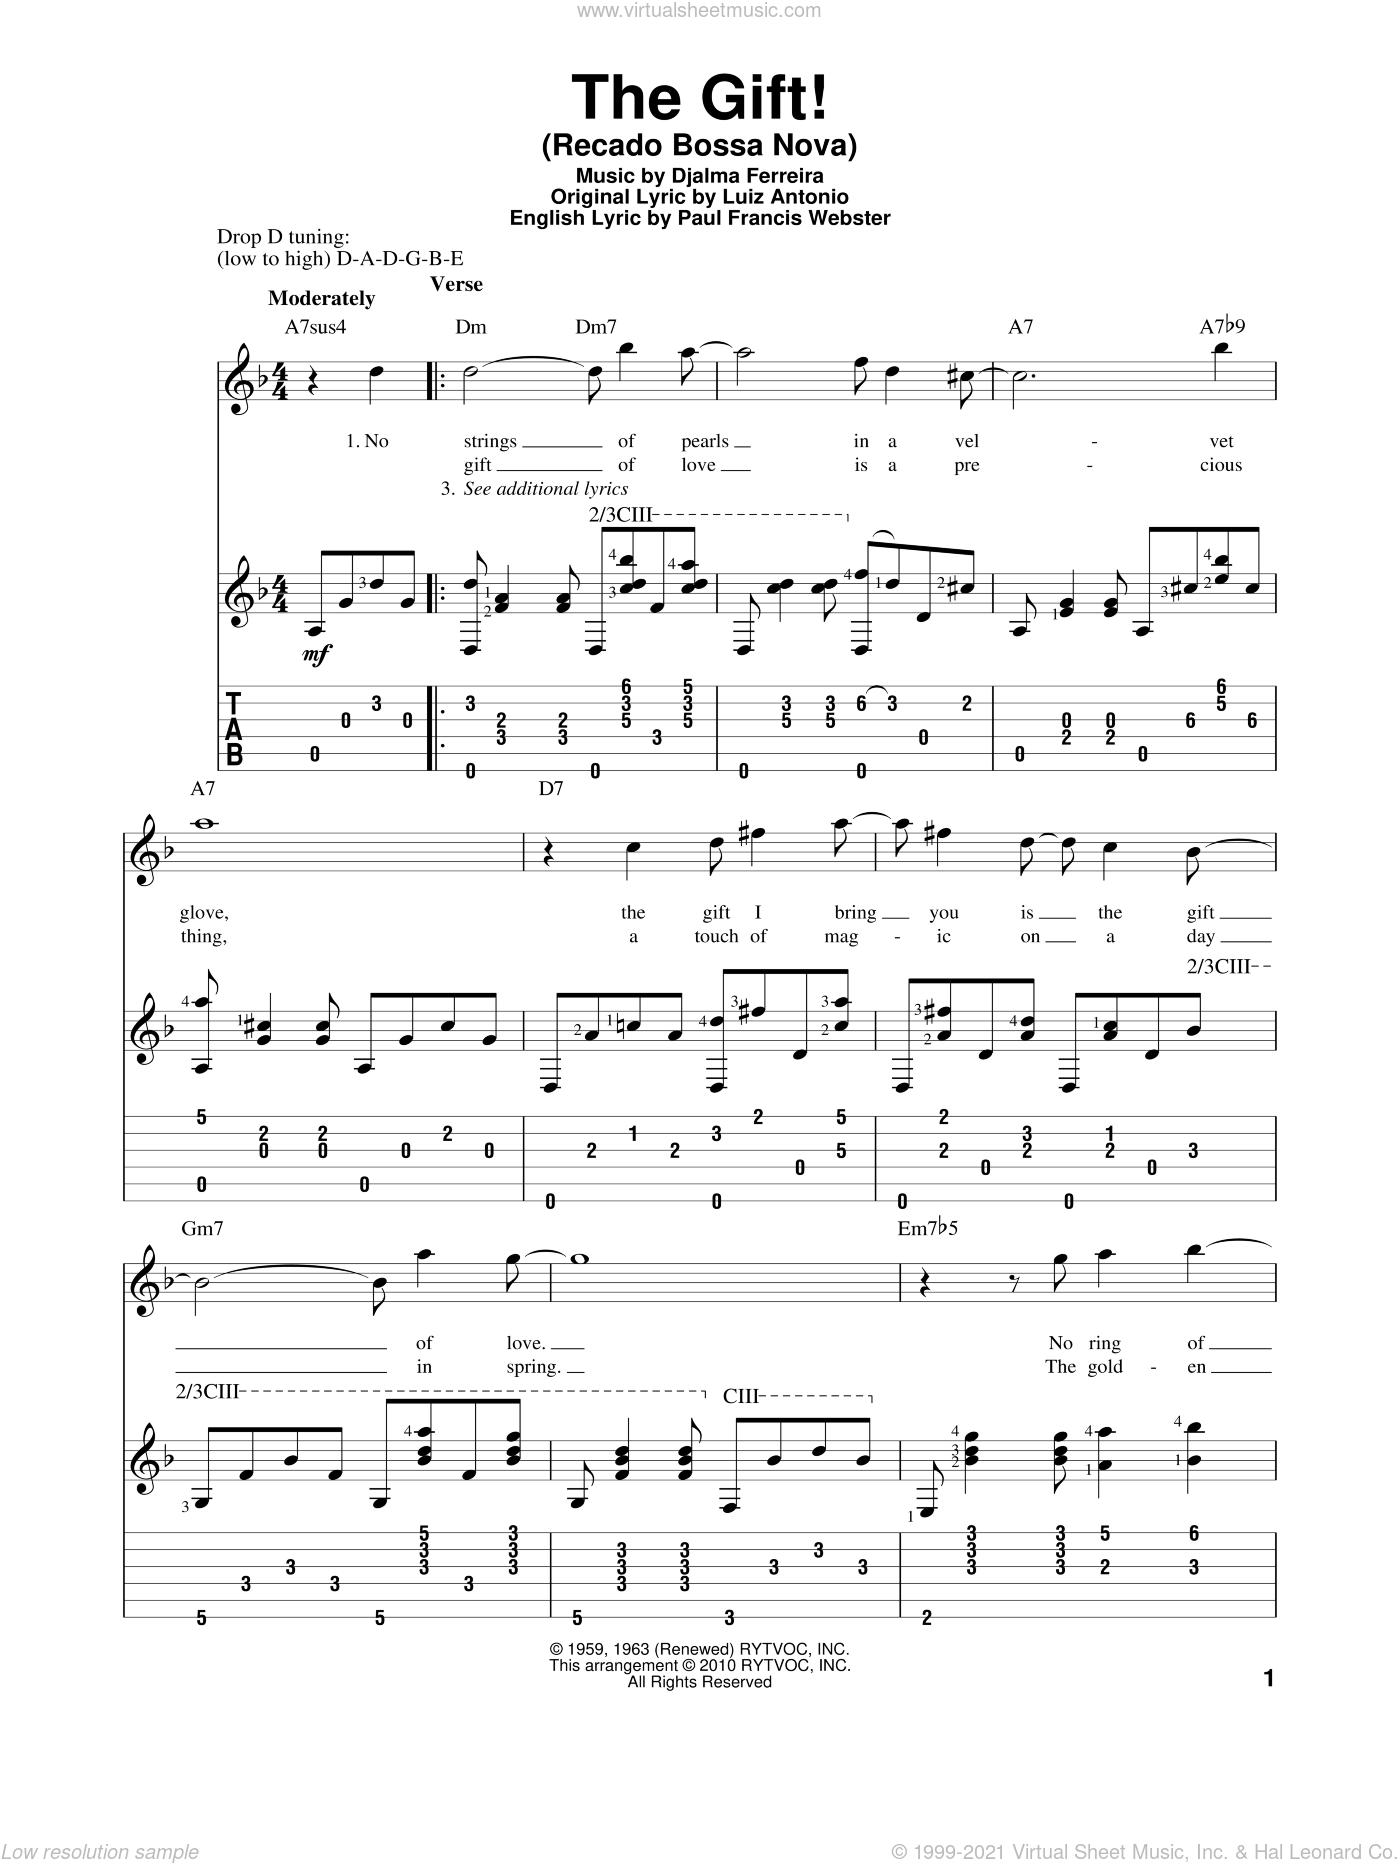 The Gift! (Recado Bossa Nova) sheet music for guitar solo by Luiz Antonio, Djalma Ferreira and Paul Francis Webster, intermediate skill level